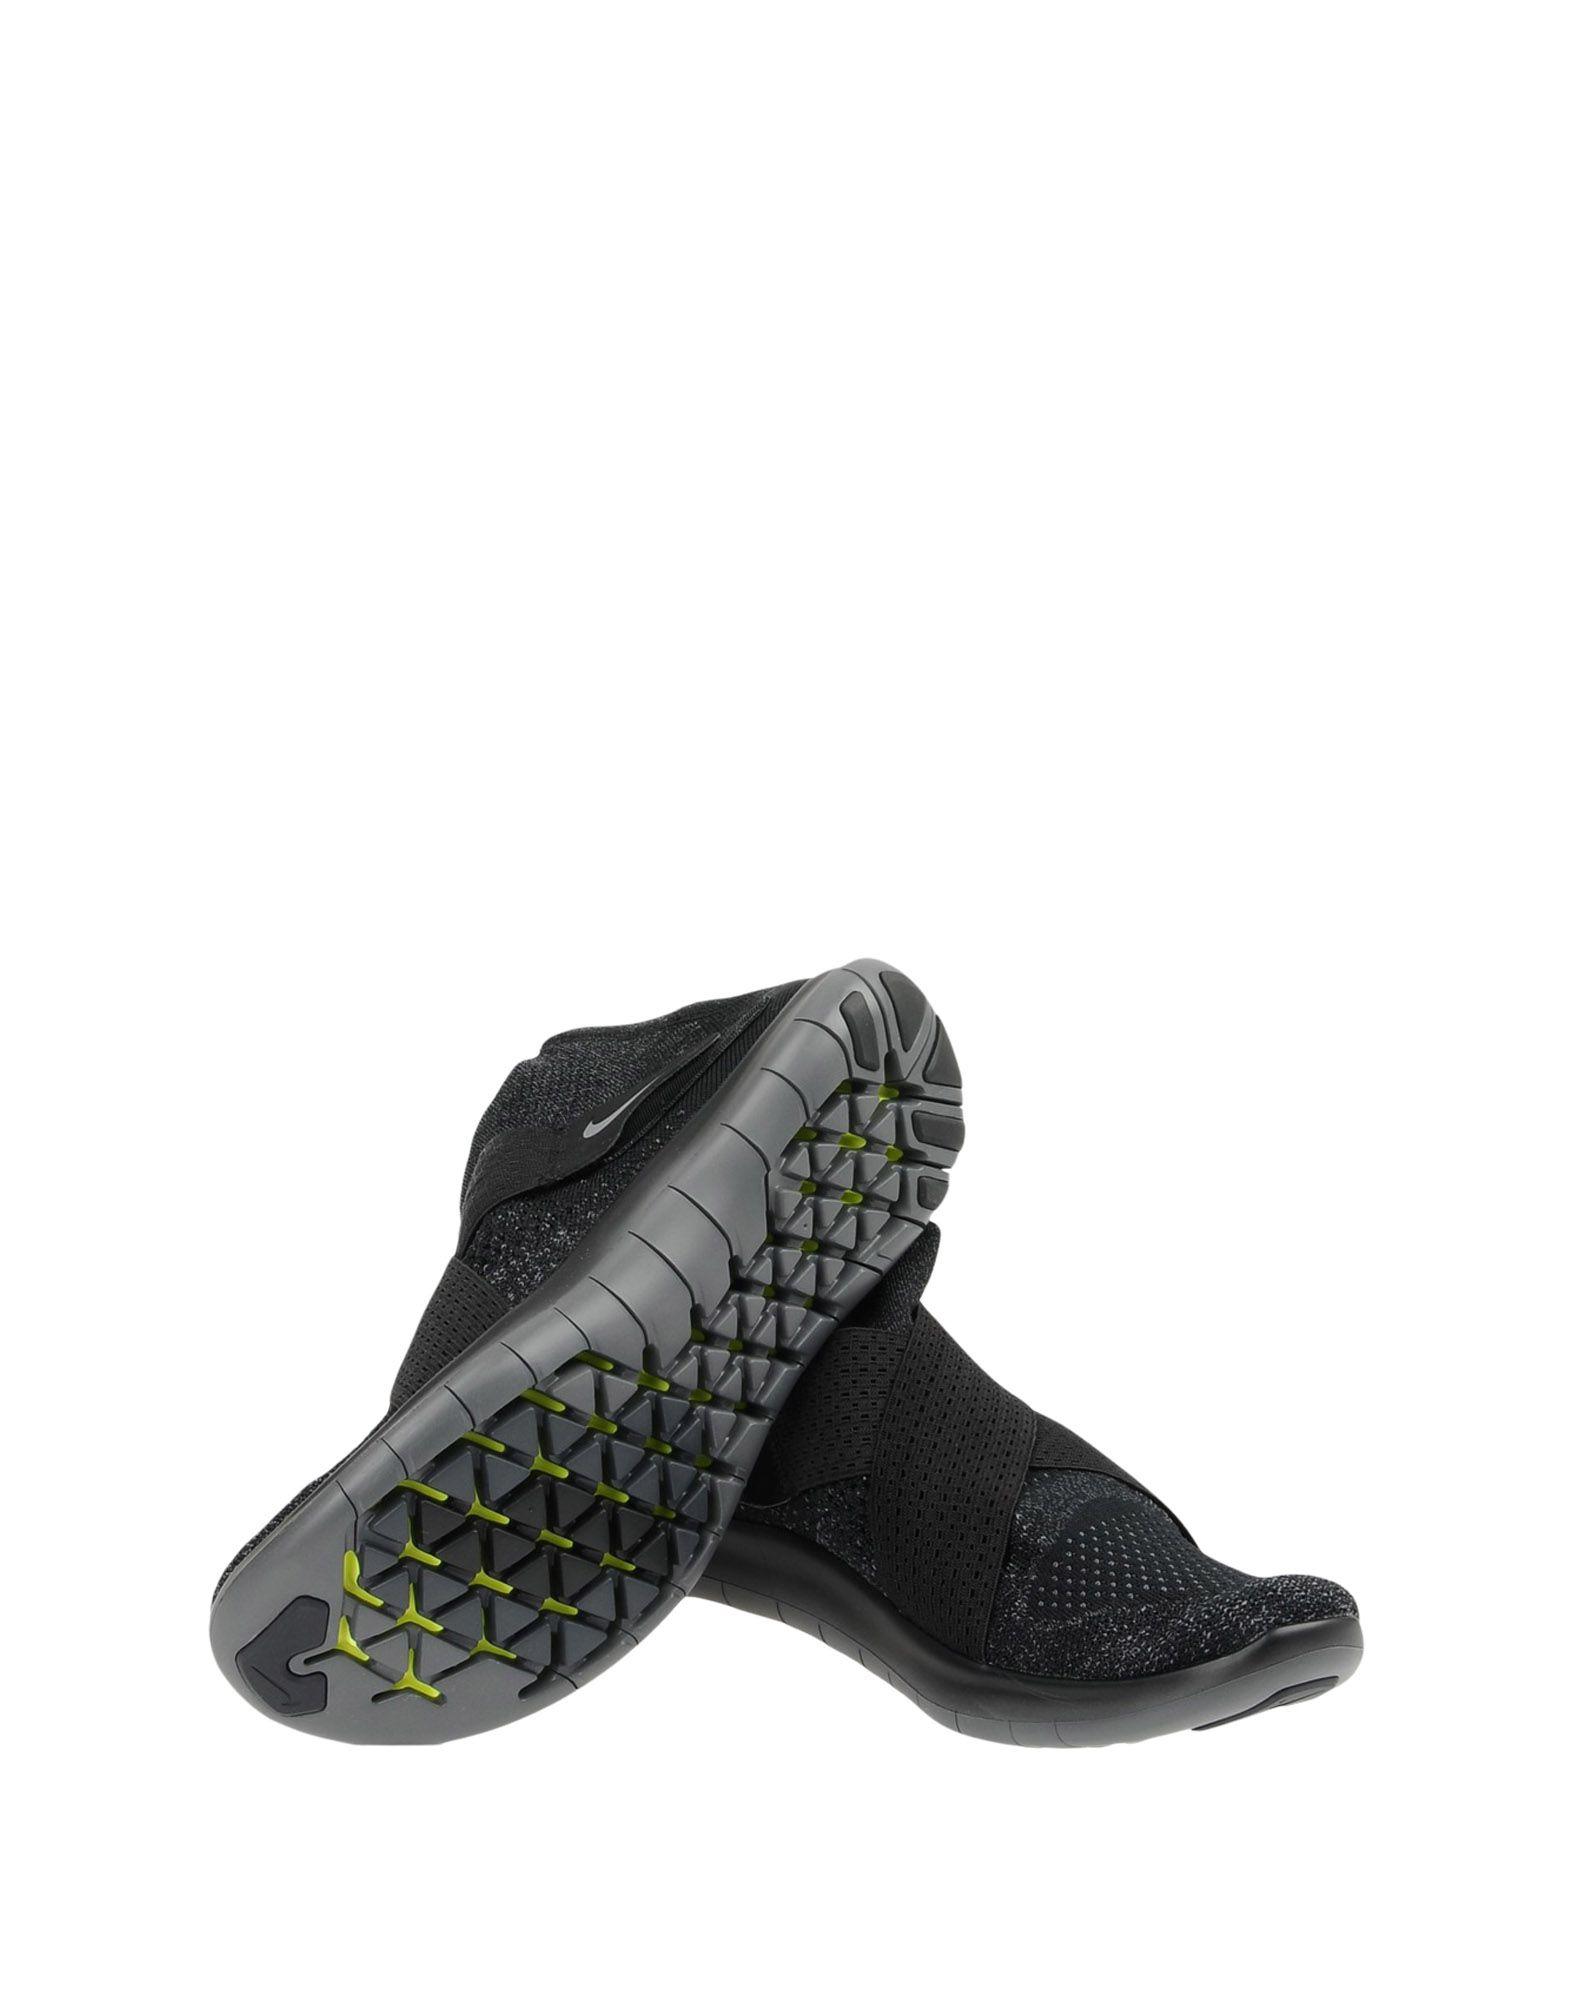 Nike  Free Run Motion Fk 2017  11376676XM Gute Qualität beliebte Schuhe